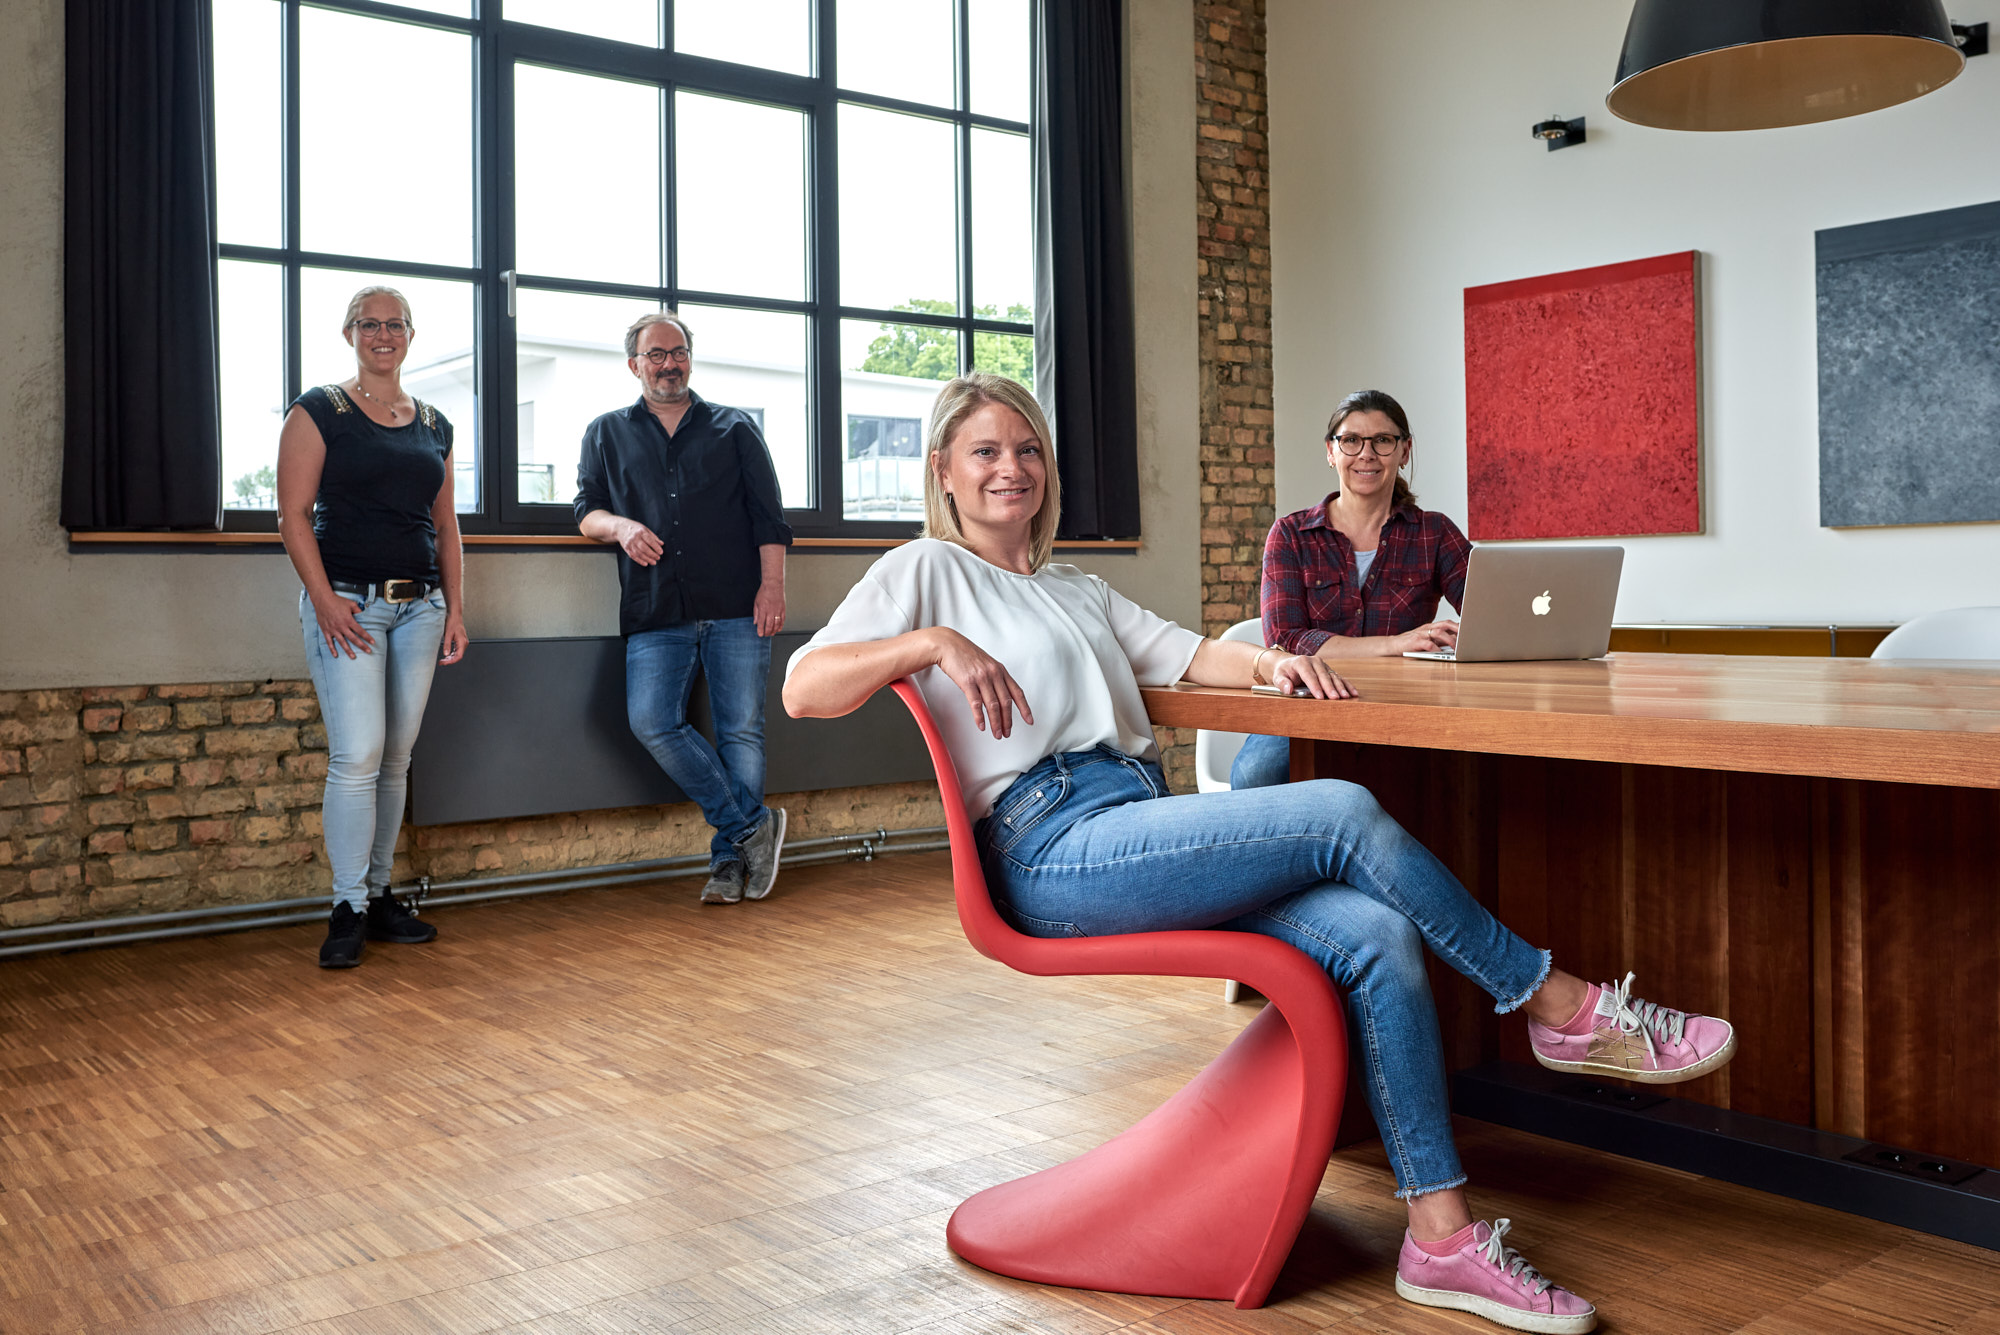 svenka bold sind: Christiane Scriba, Frank Krupka, Svenja Lenz, Andrea Zomerdijk